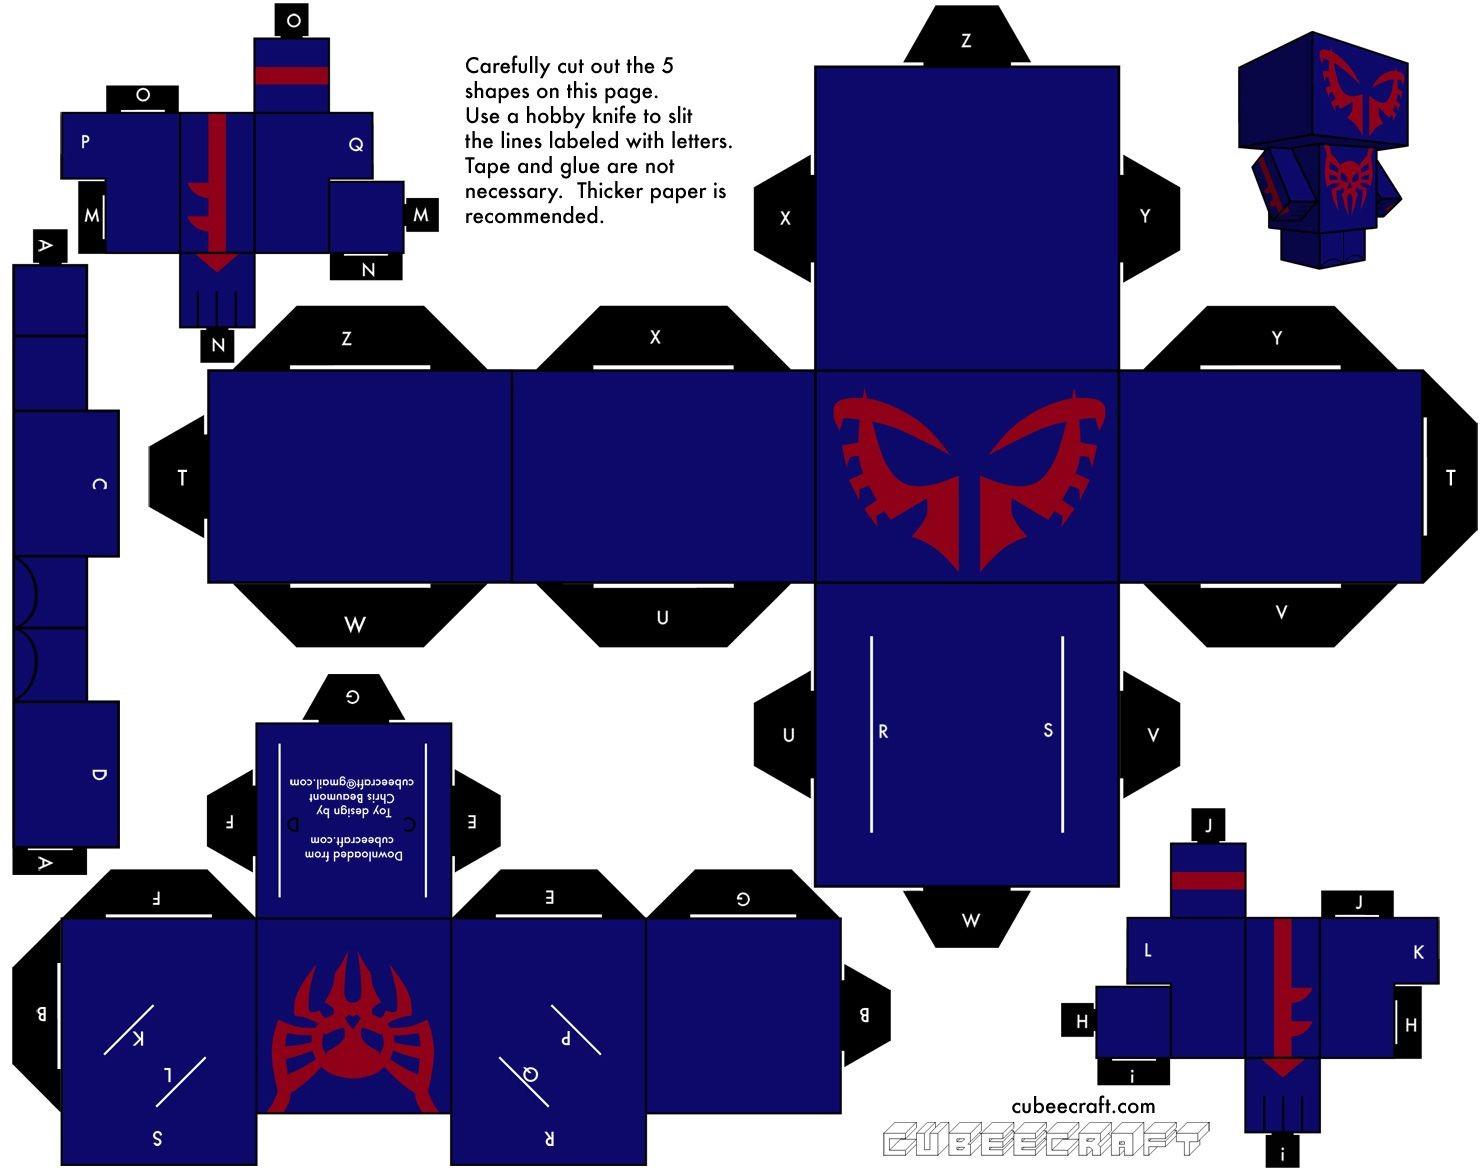 Marvel Papercraft Marvel En Cubeecraft Plantillas Para Imprimir Pinterest